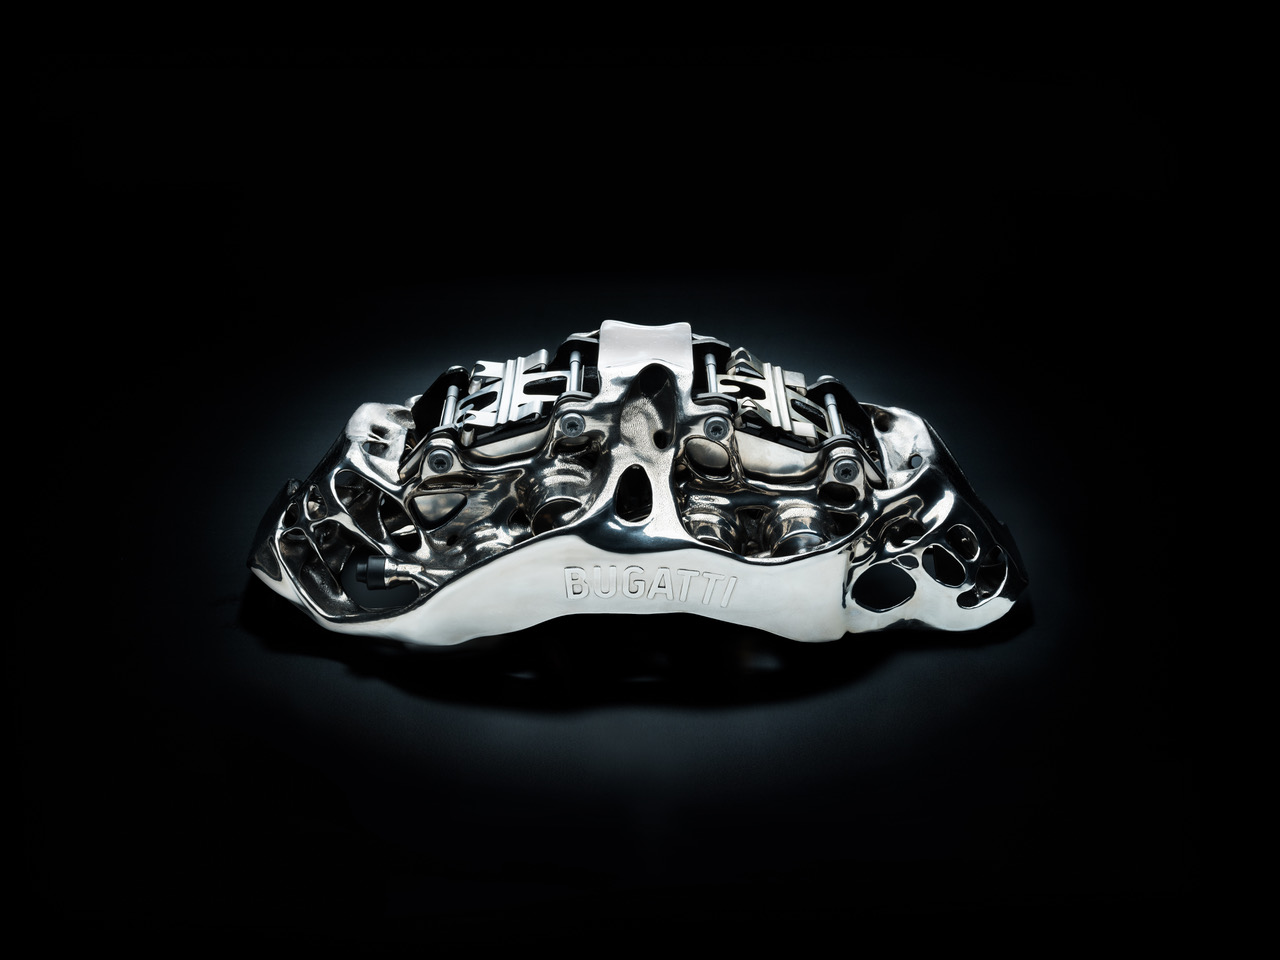 Bugatti 3D printed titanium brakes to stop its $3 million Chiron supercar